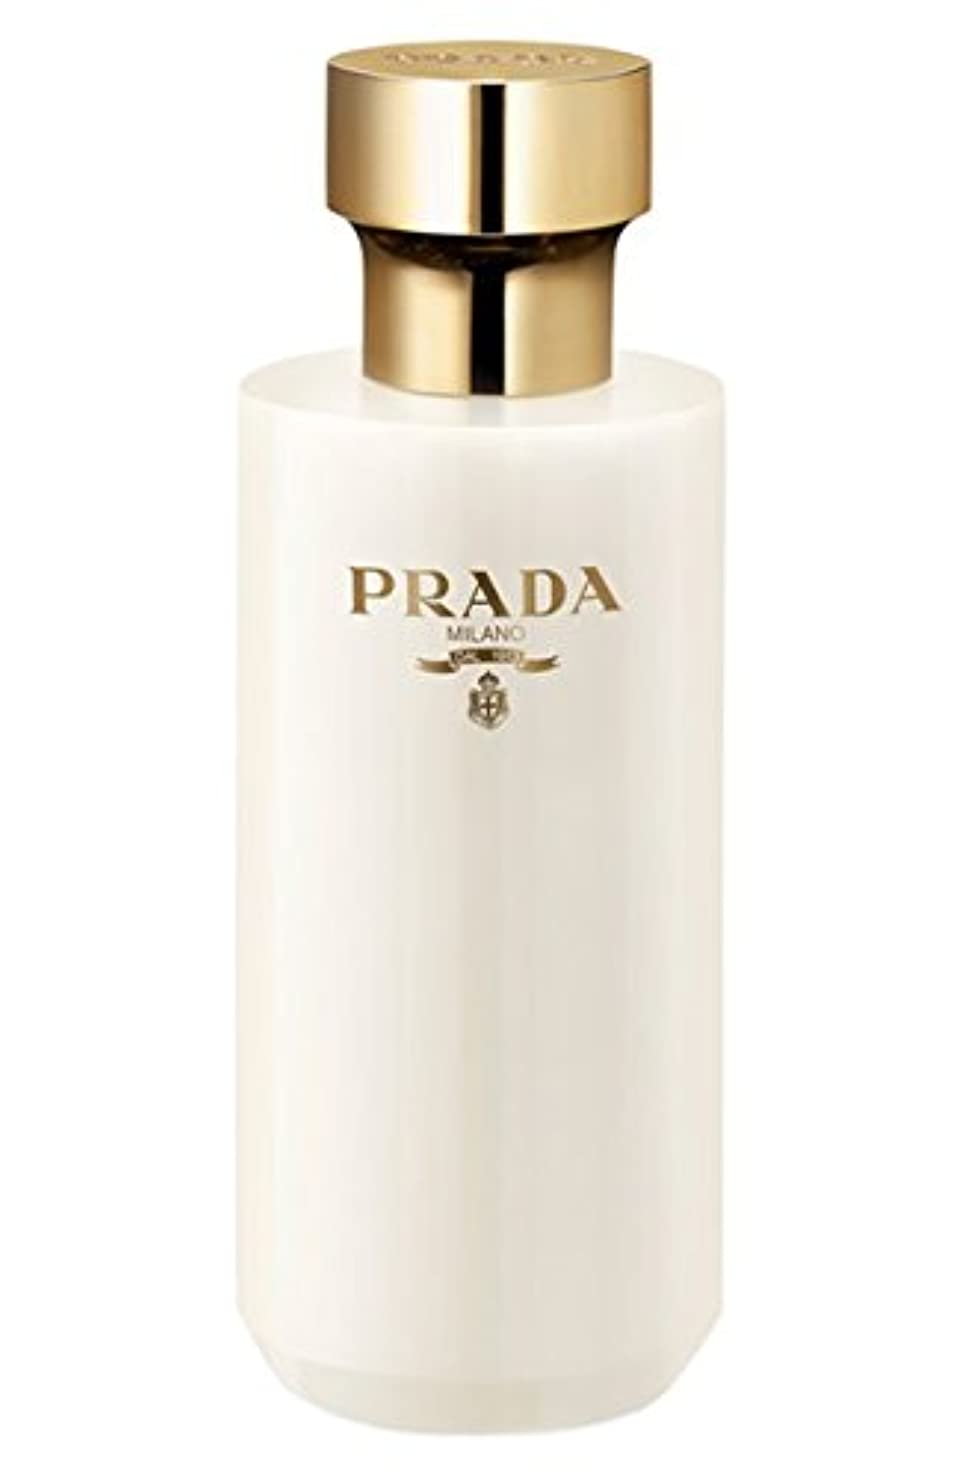 La Femme Prada (ラ フェム プラダ) 6.7 oz (200ml) Shower Cream for Women